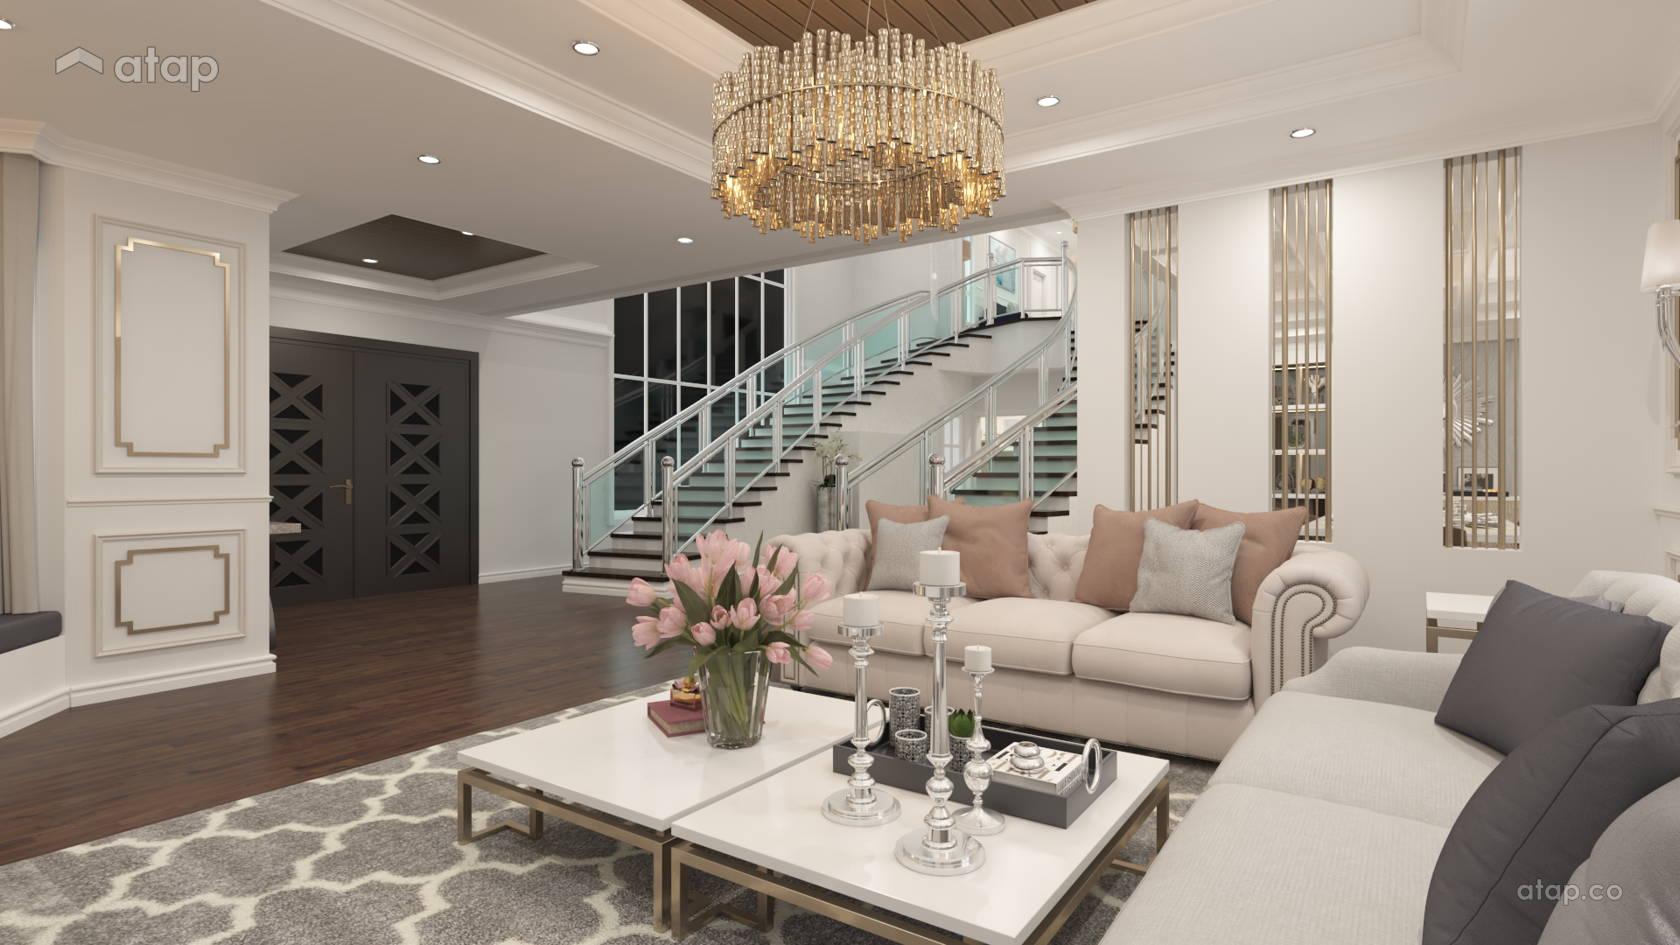 Modern Vintage Living Room Bungalow Design Ideas Photos Malaysia Atap Co